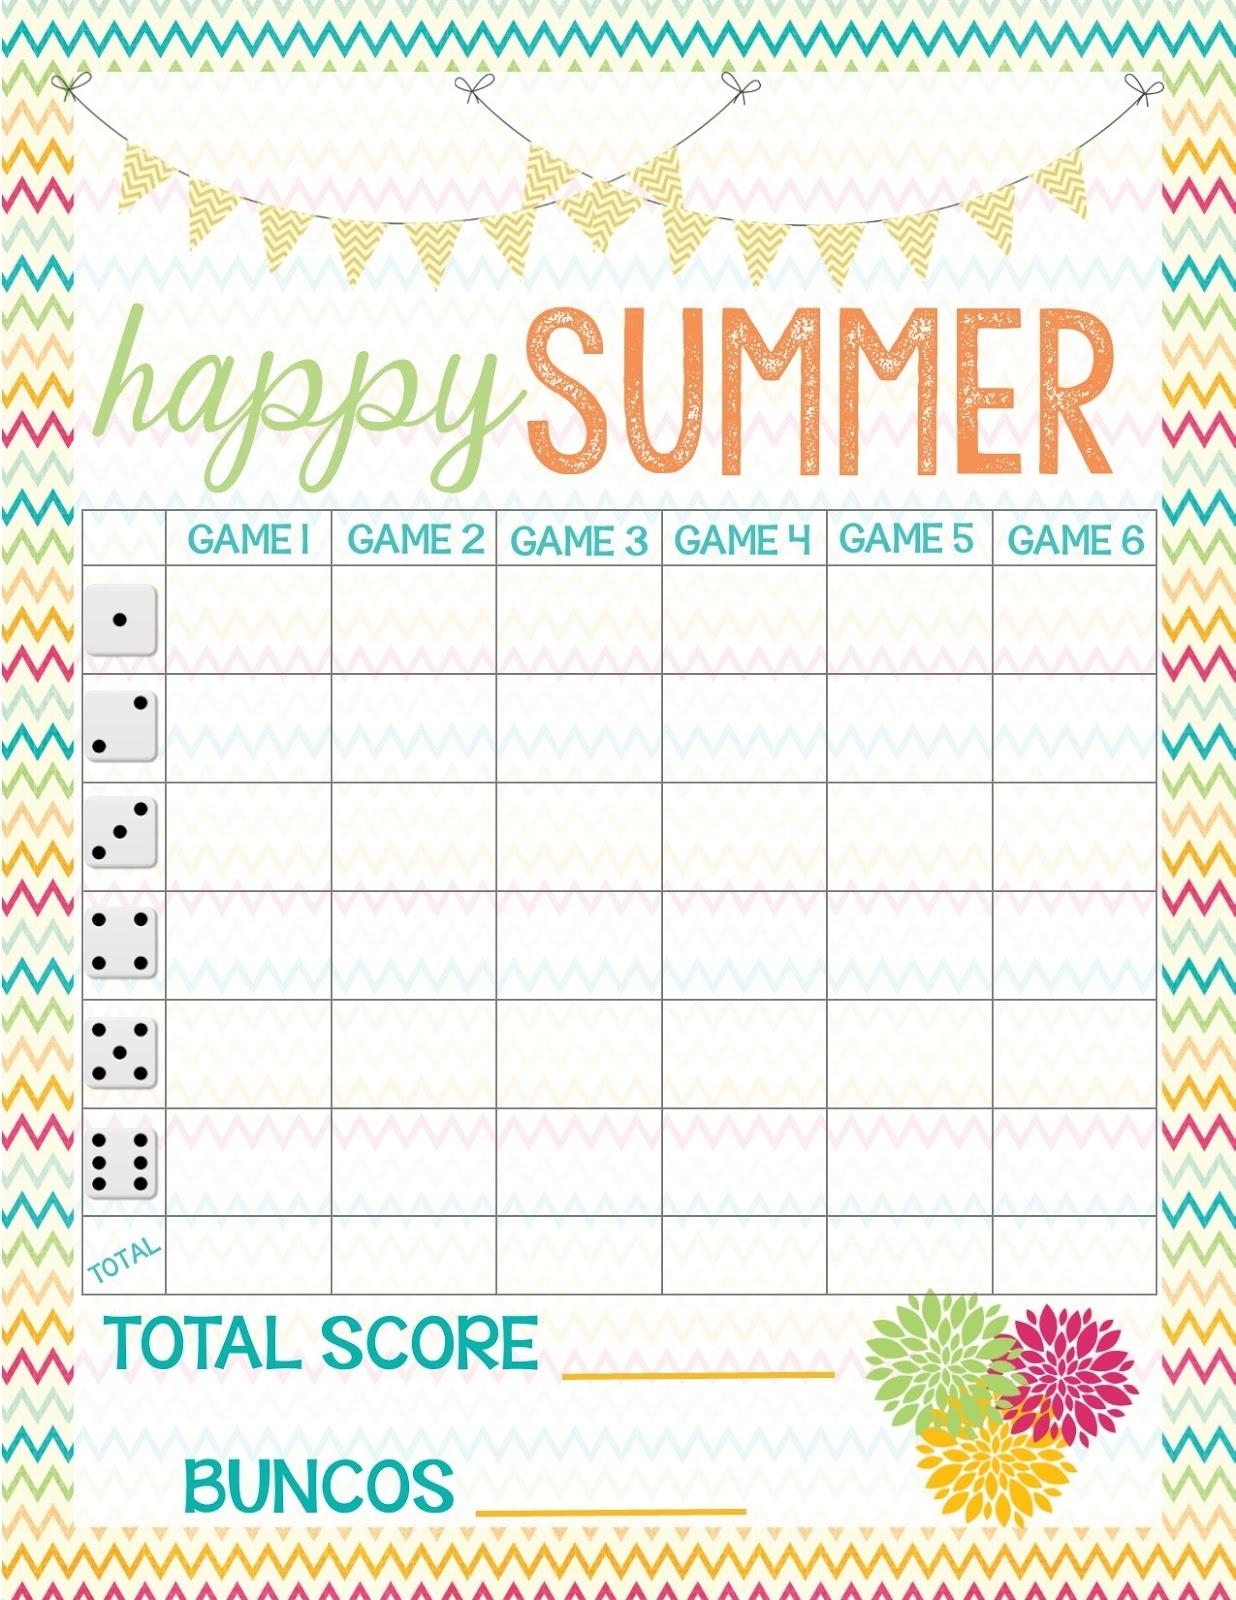 Recipes From Stephanie: Free Bunco Score Sheet - Free Printable Bunco Game Sheets